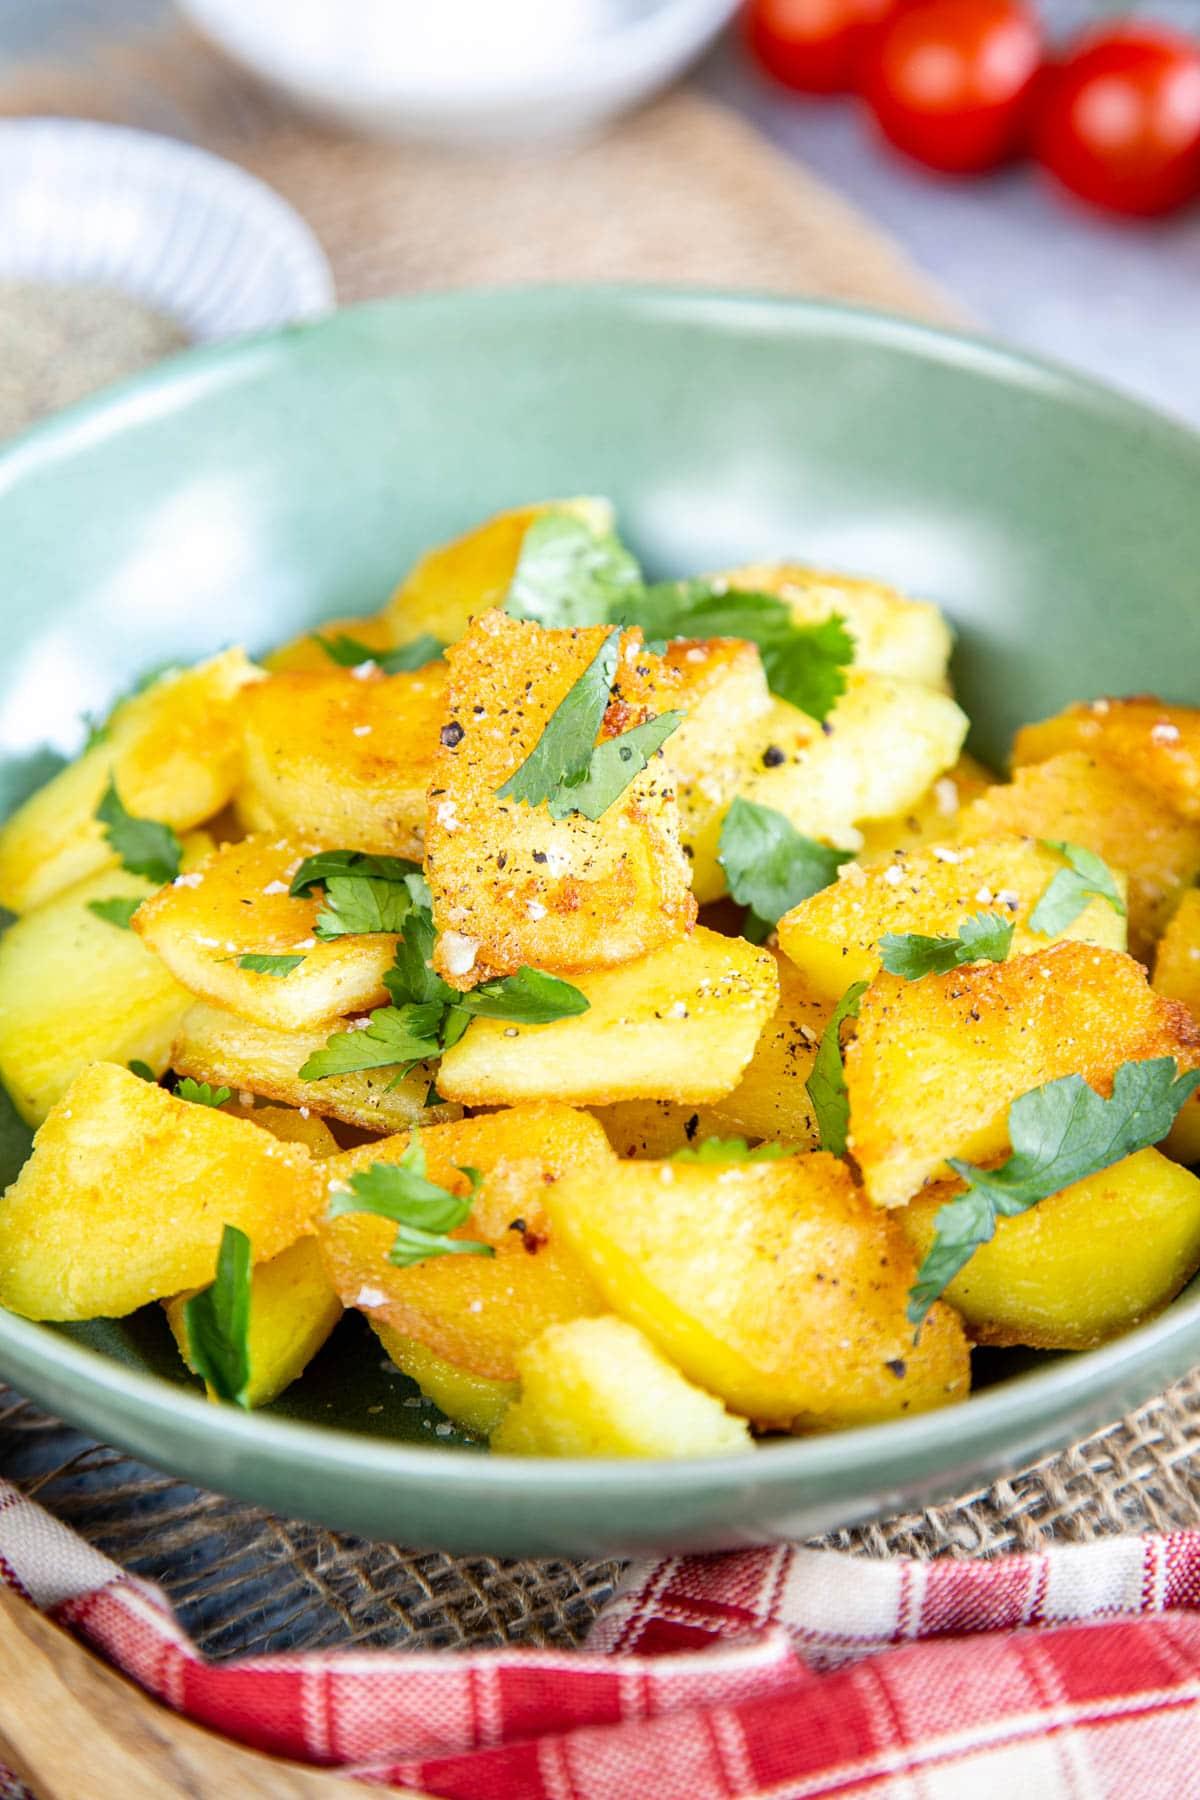 A green ceramic bowl full of golden crispy fried potatoes